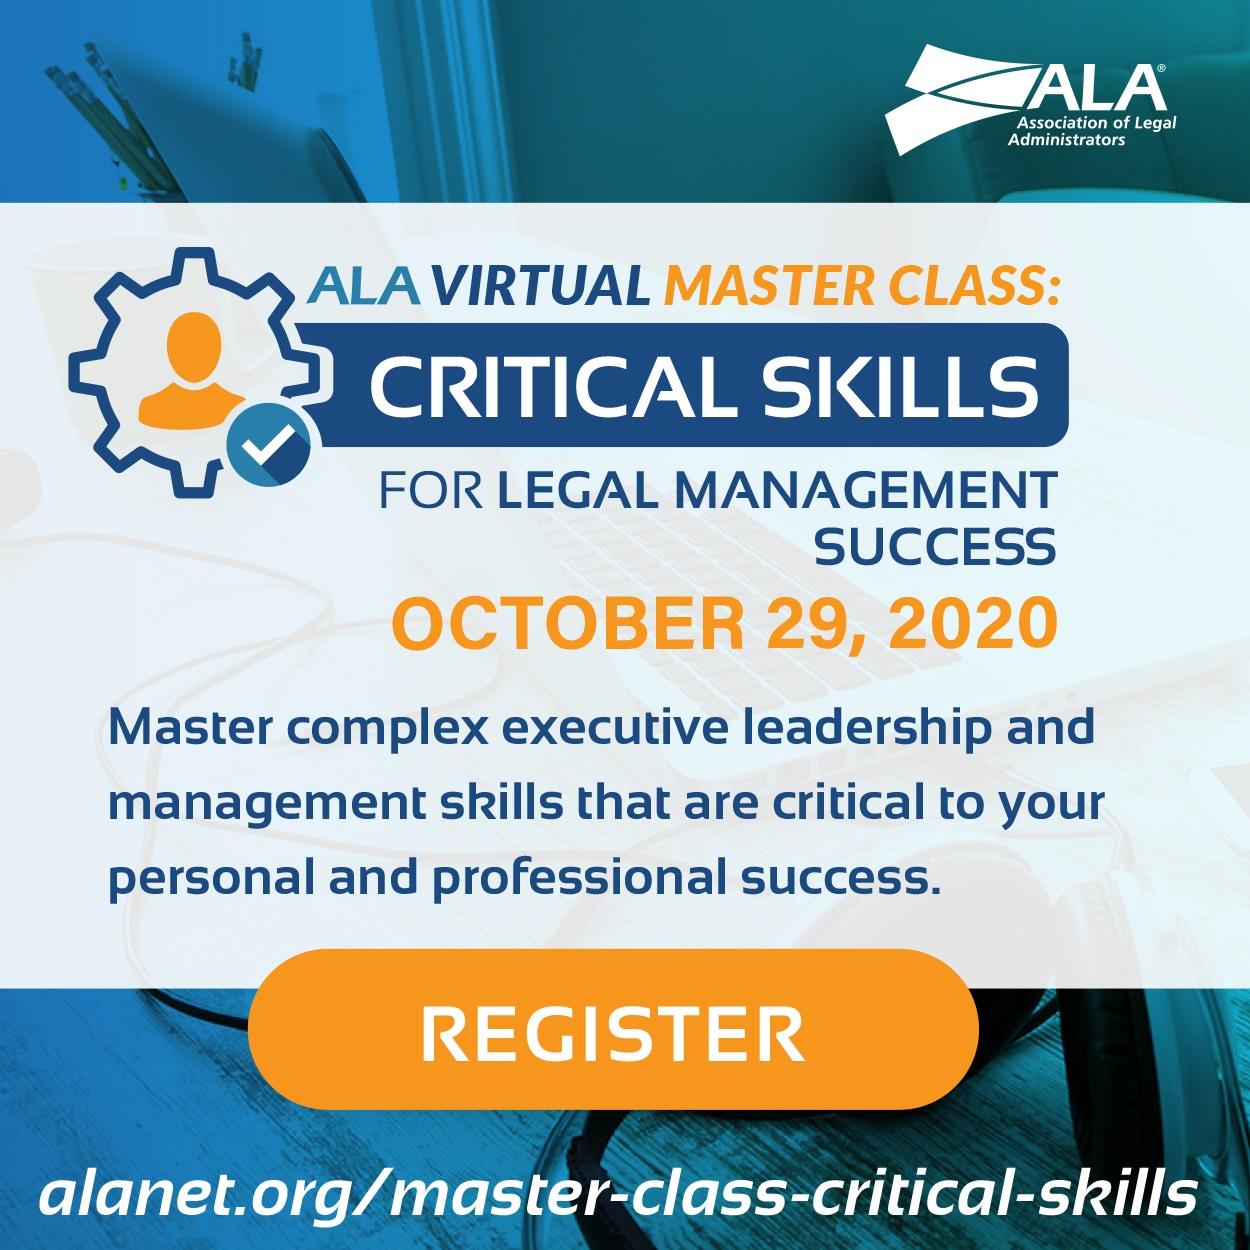 ALA Virtual Master Class Critical Skills